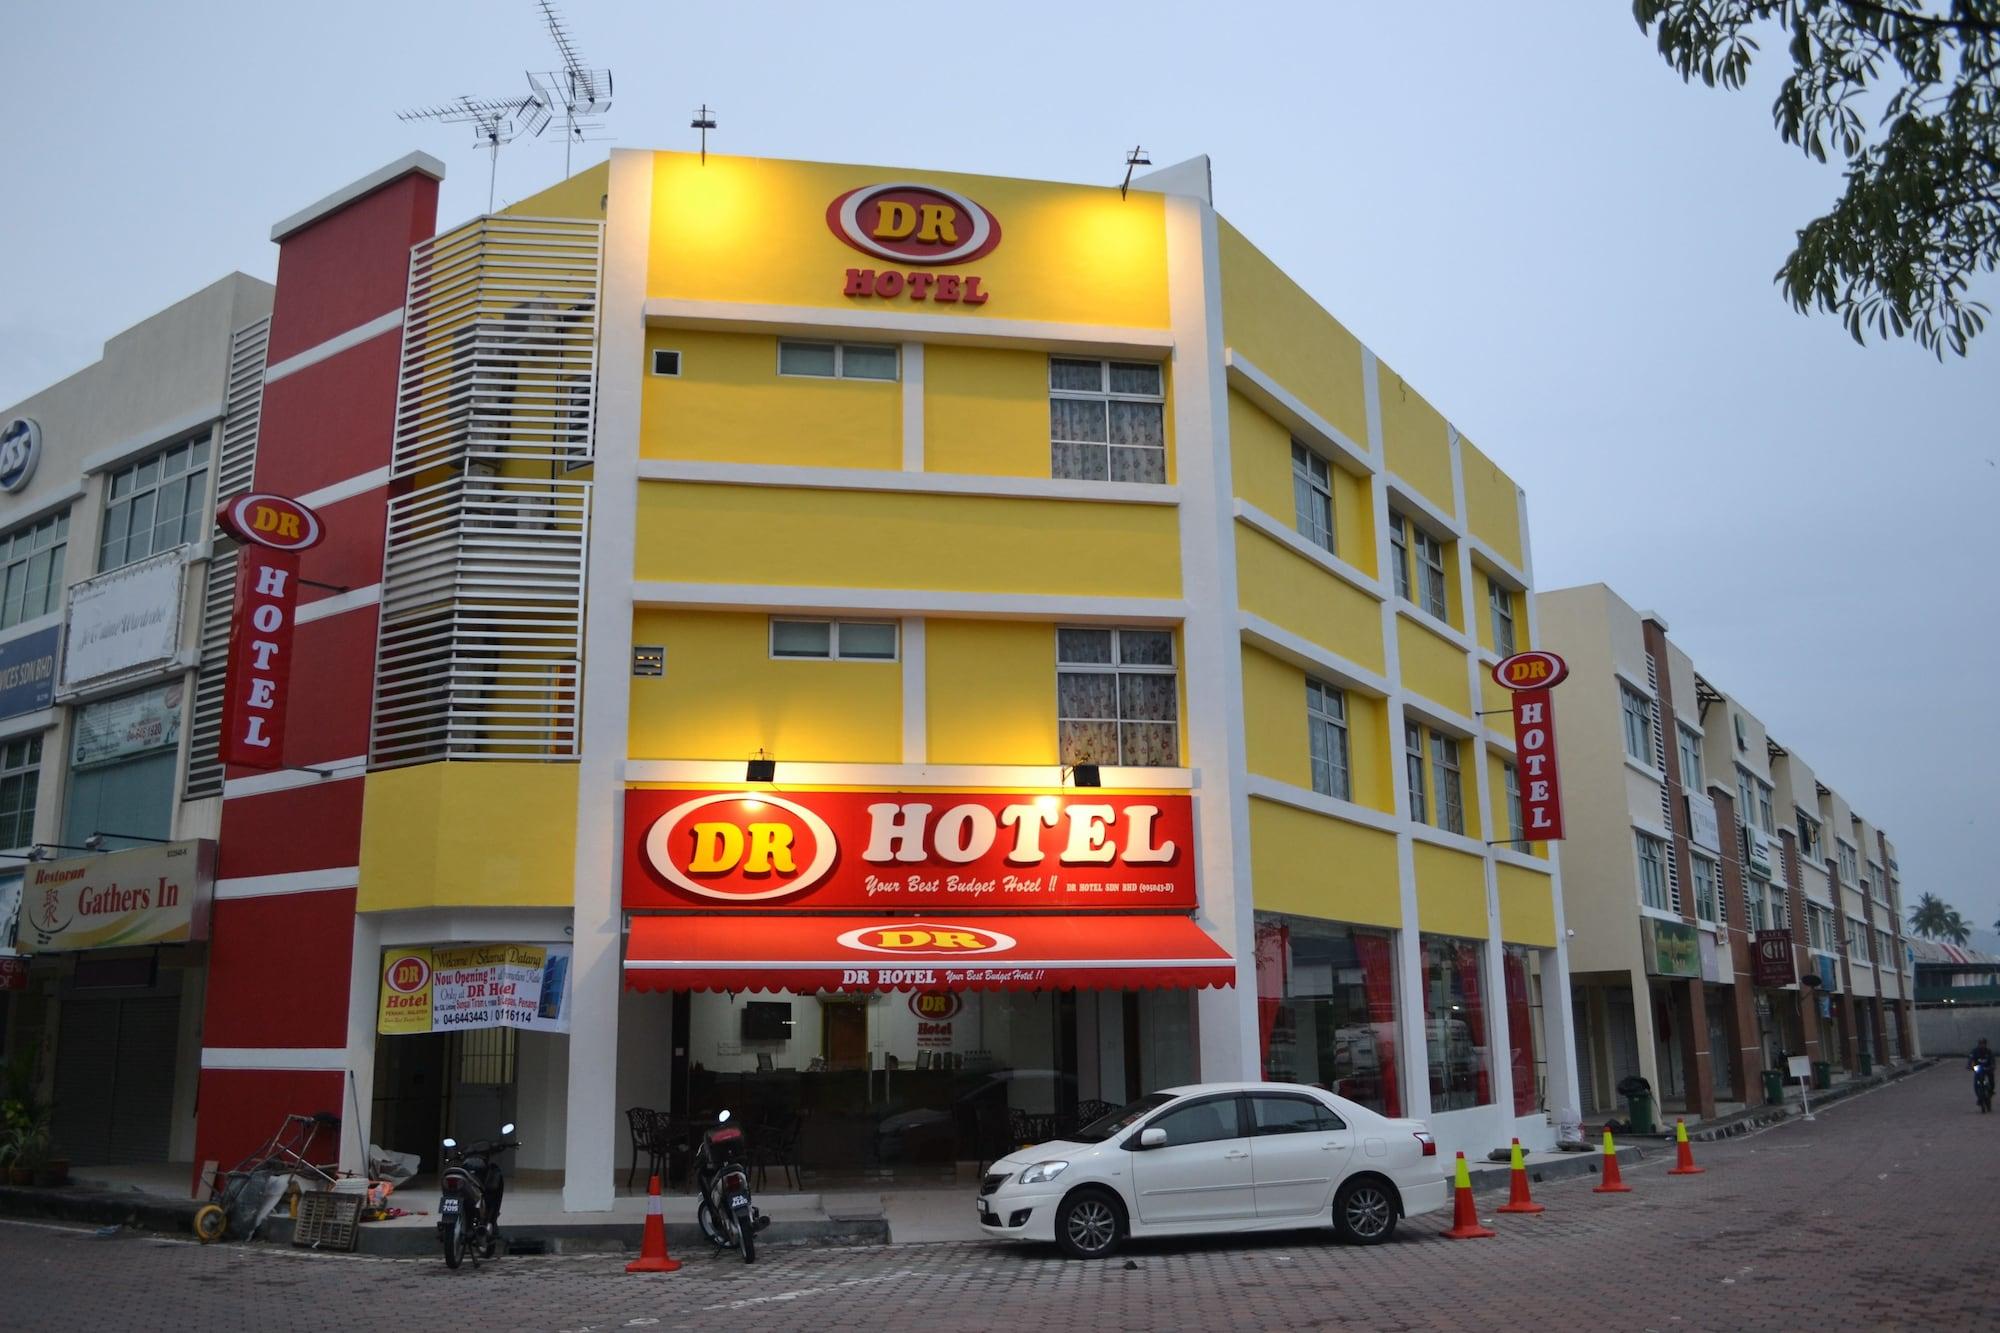 DR Hotel, Barat Daya